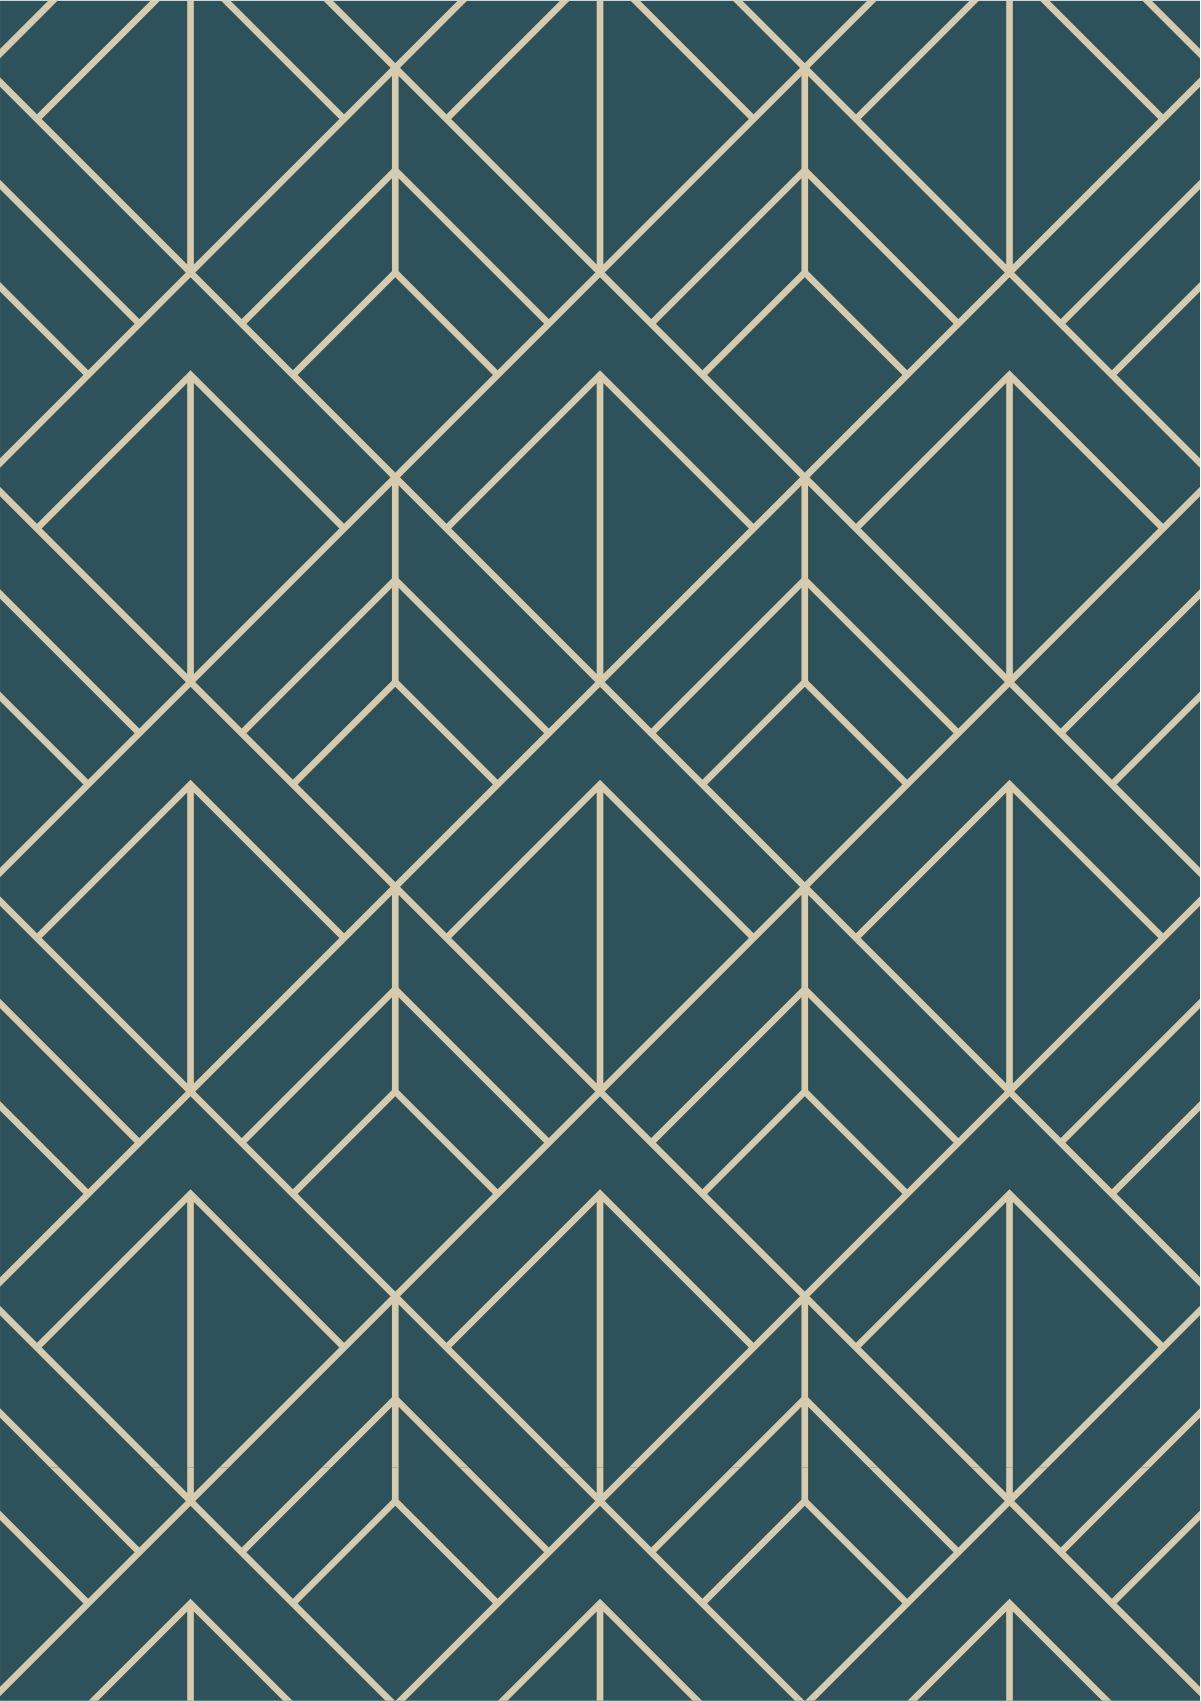 Geometric Art Deco Patterns Geometric Pattern Wallpaper Art Deco Pattern Art Deco Patterns